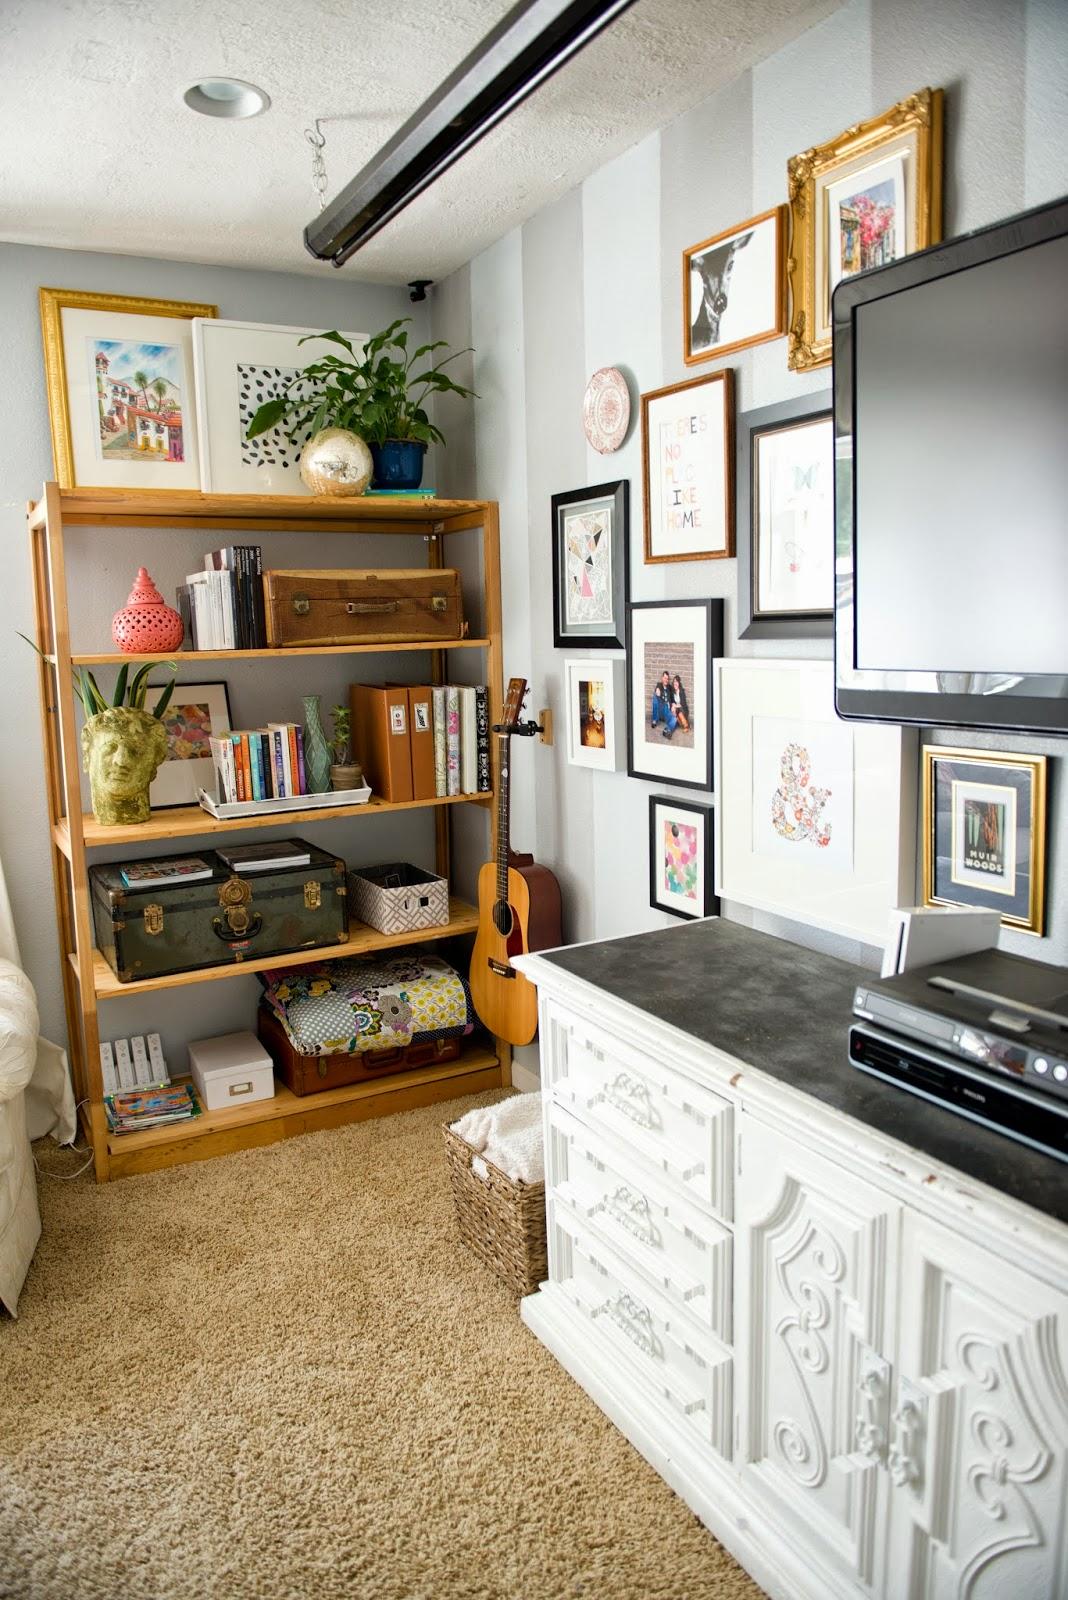 Domestic Fashionista: Decorating Around The TV And A New Shelf